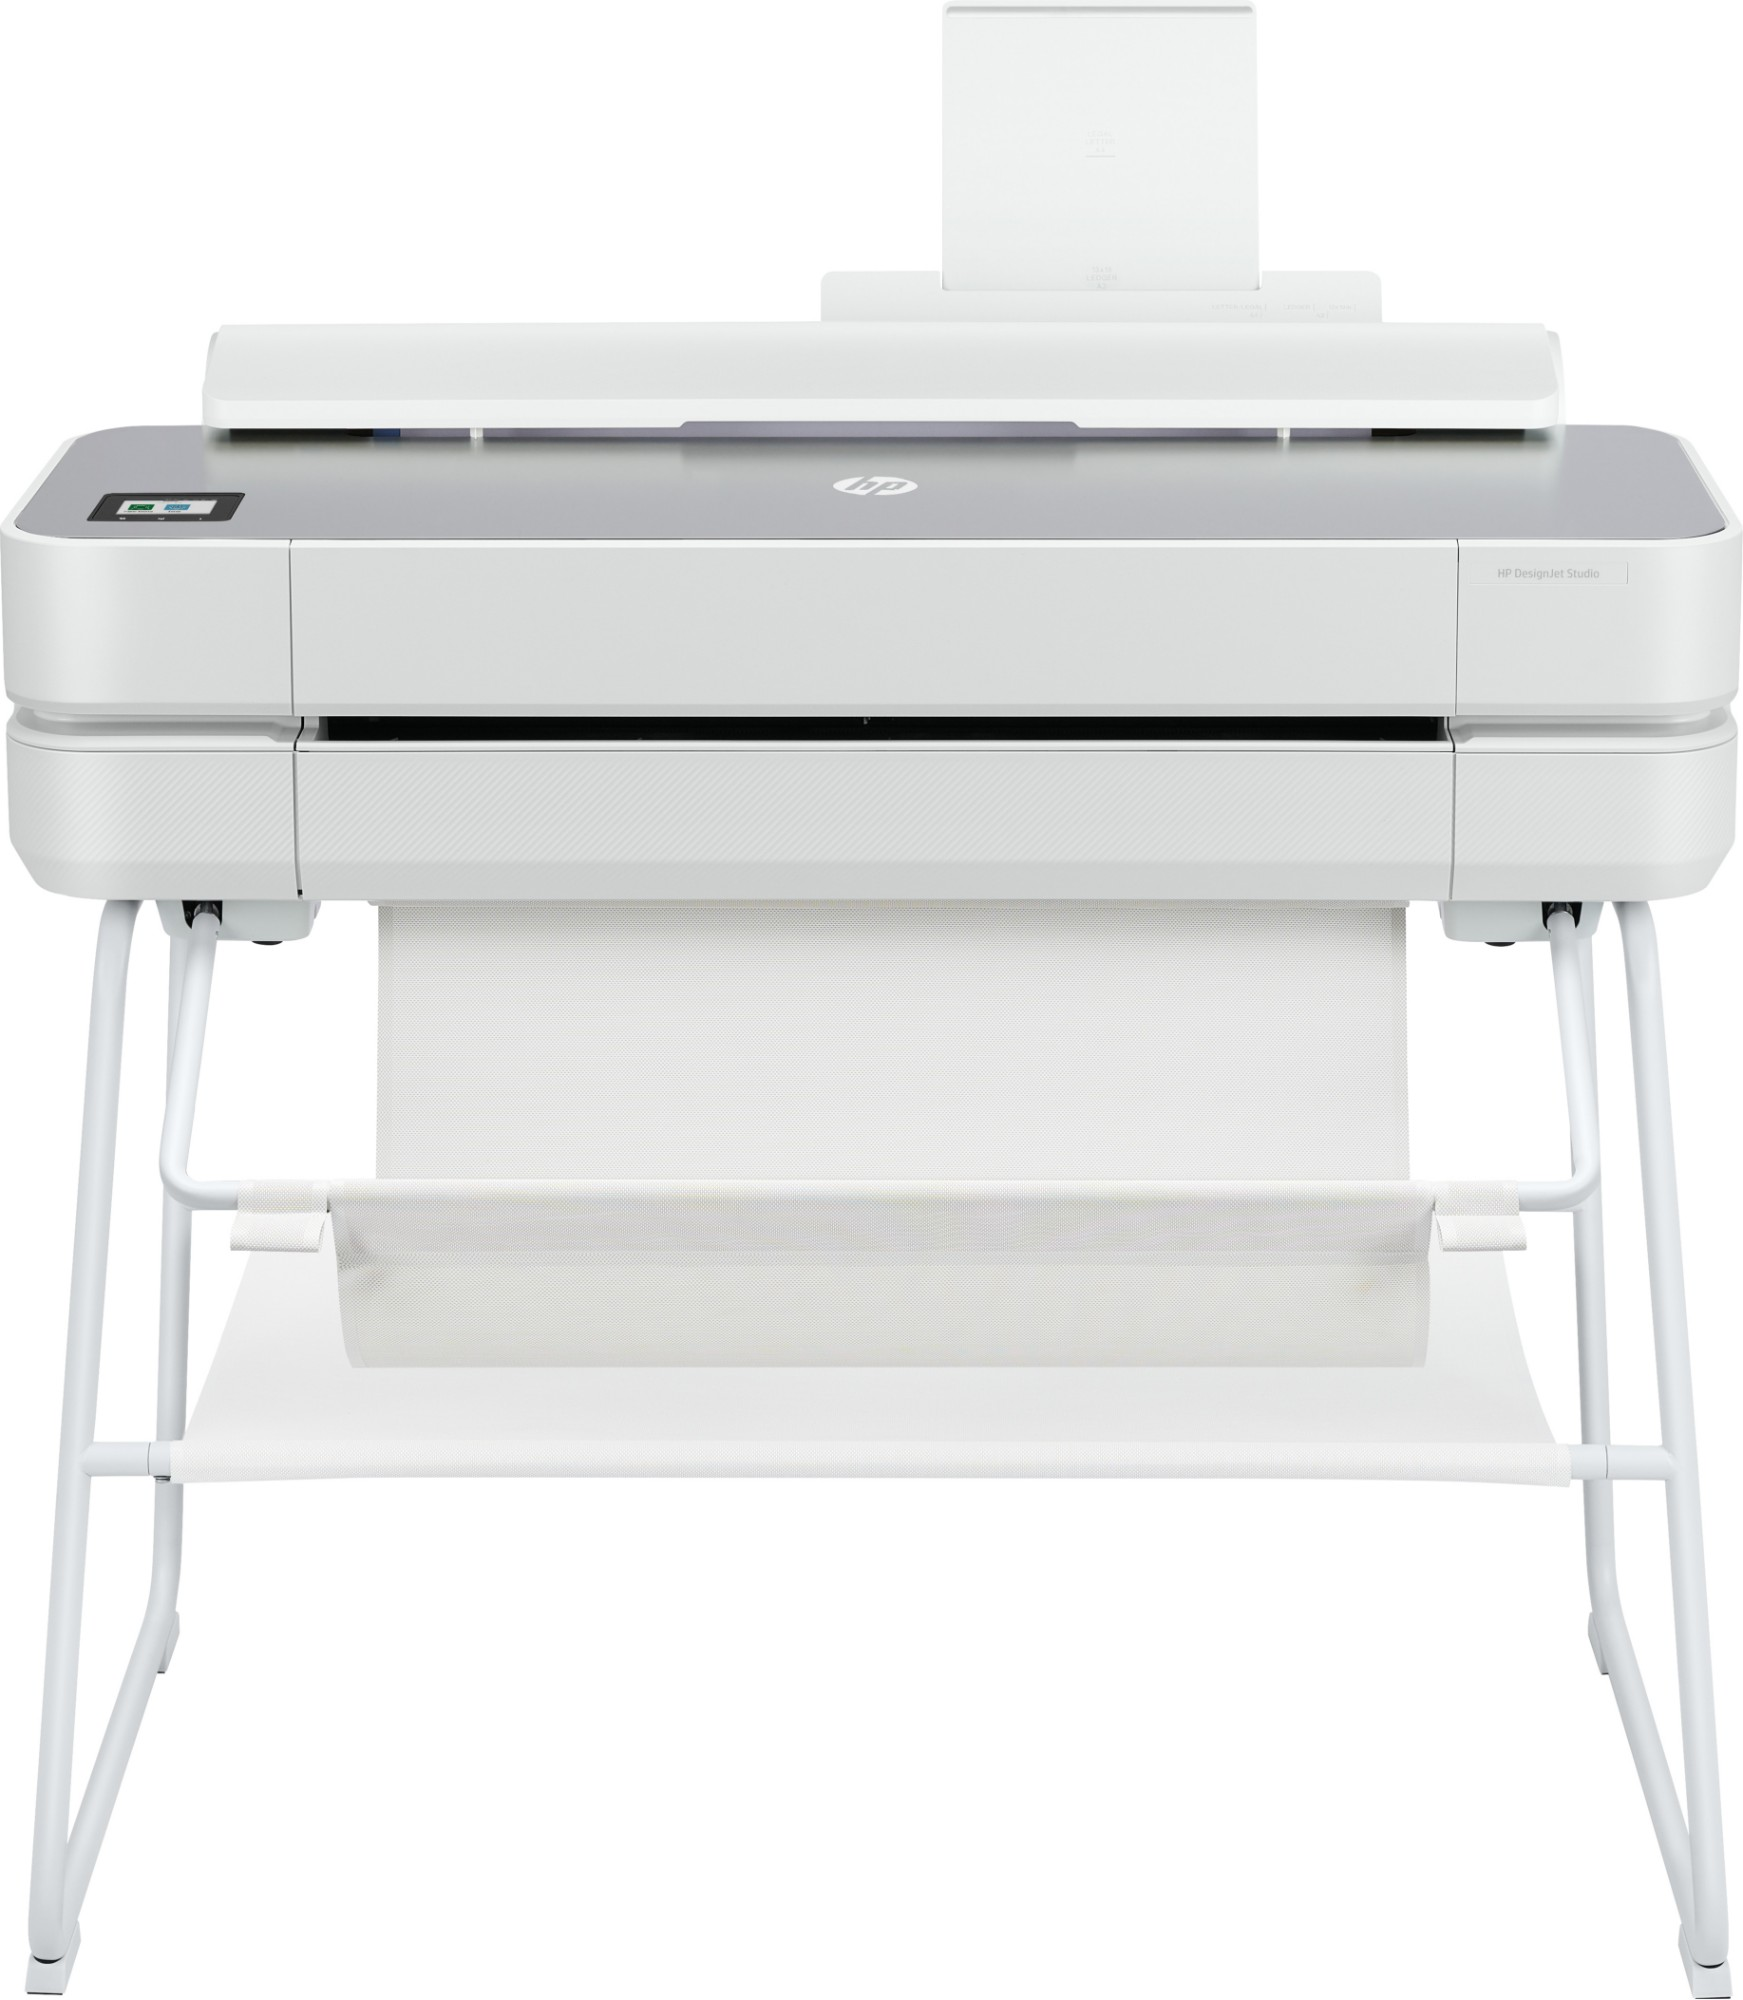 HP Designjet Impresora Studio Steel de 24 large format printer Wi-Fi Thermal inkjet Colour 2400 x 1200 DPI 610 x 1897 mm Ethernet LAN